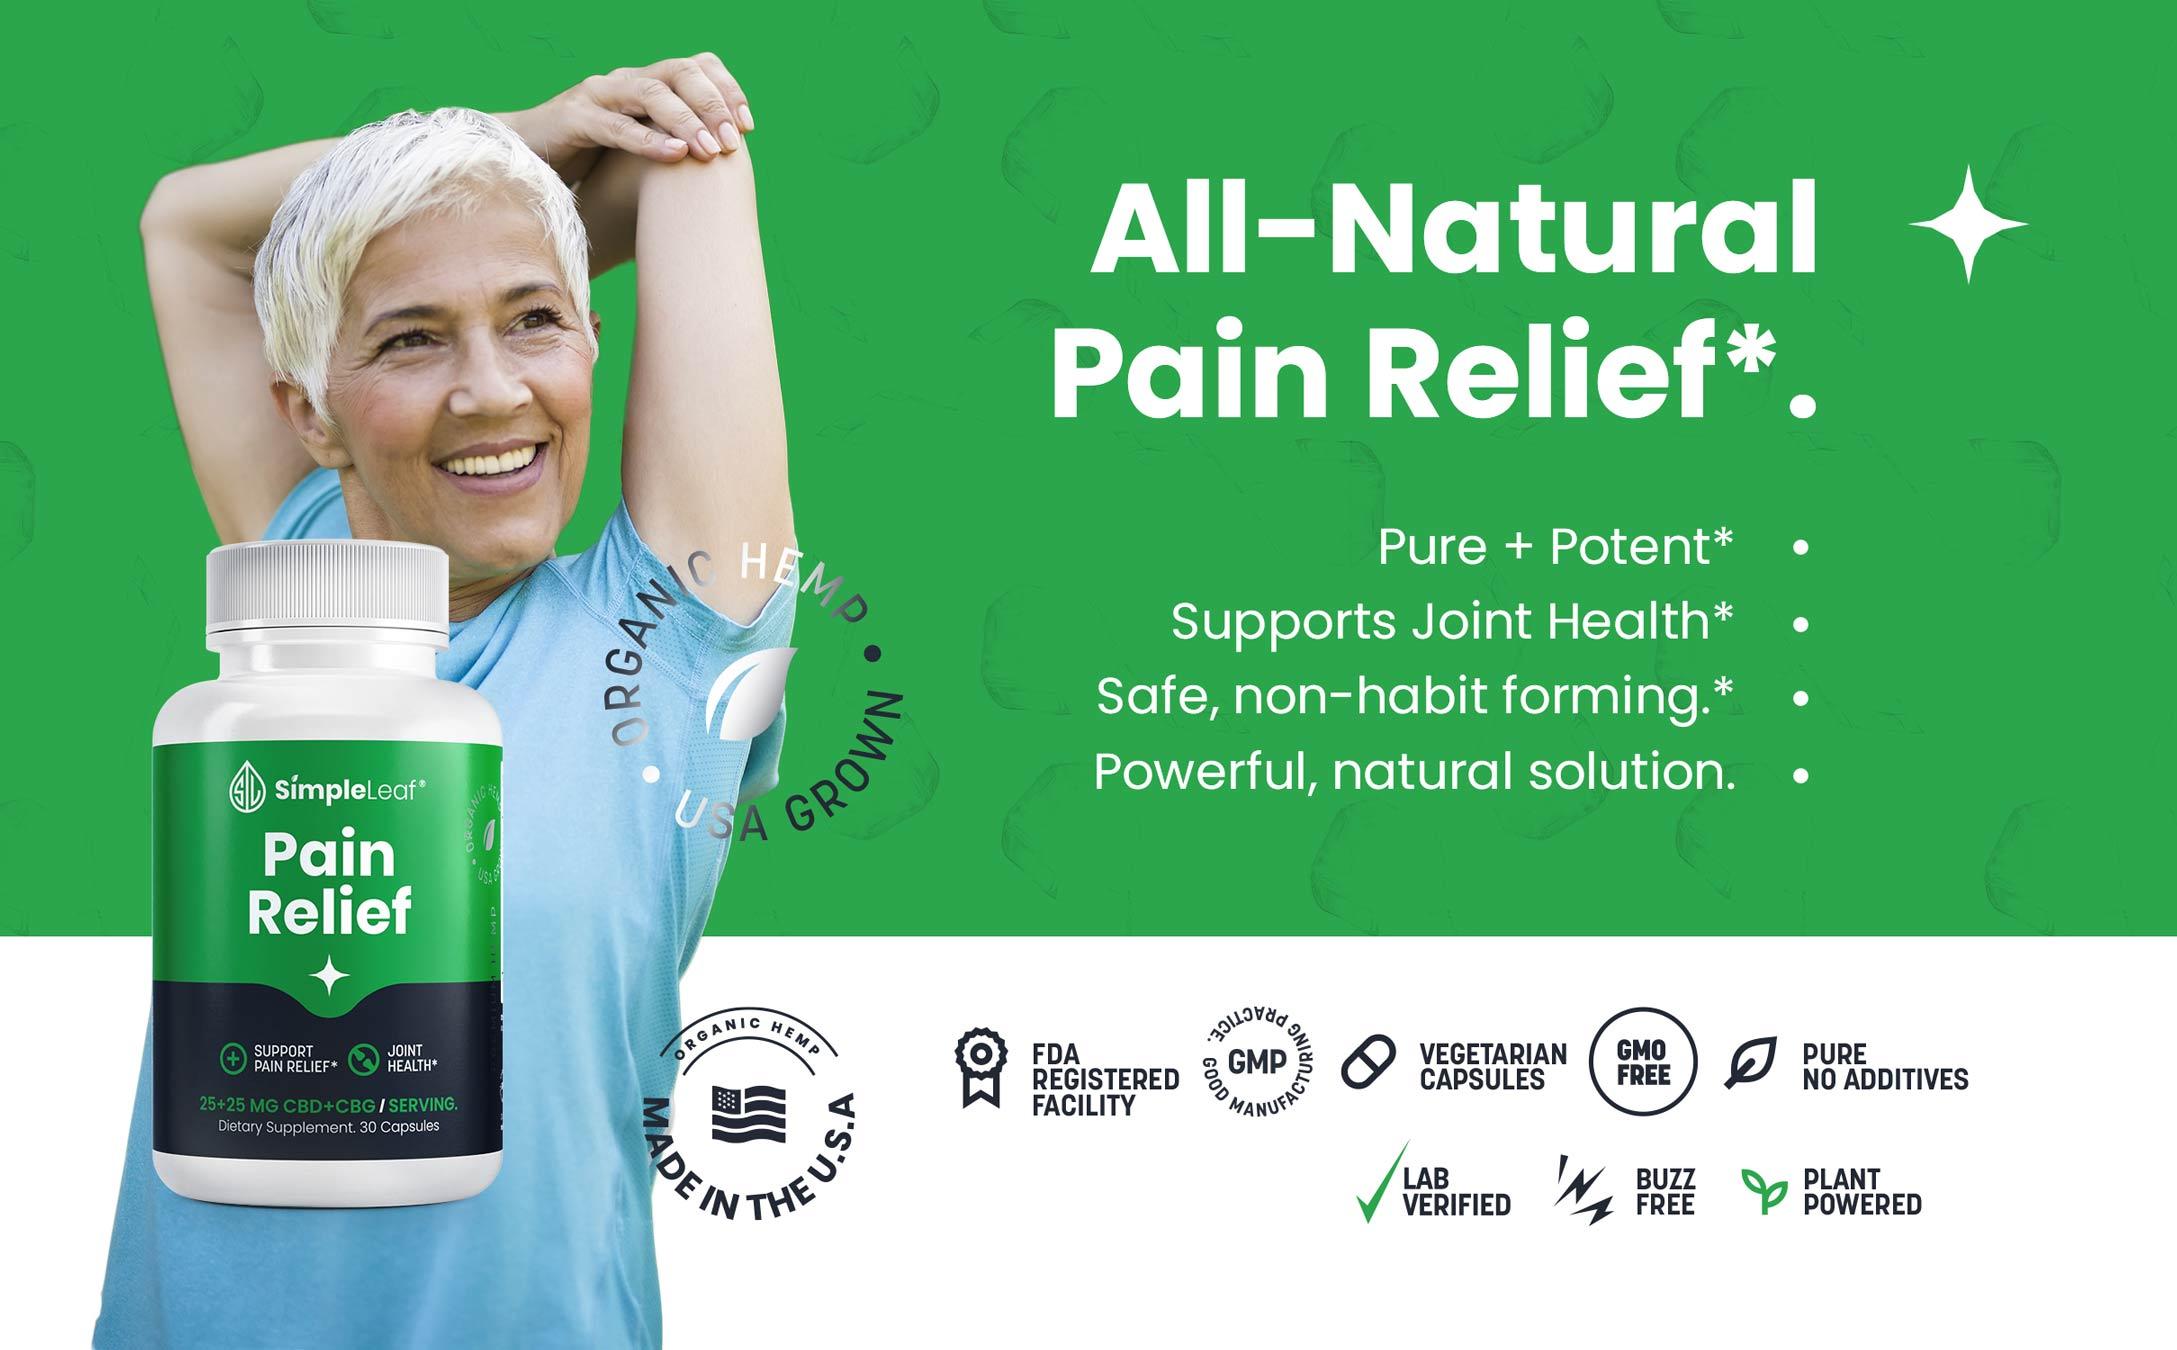 natural pain relief pills, cbd pain relief, cbg pain relief